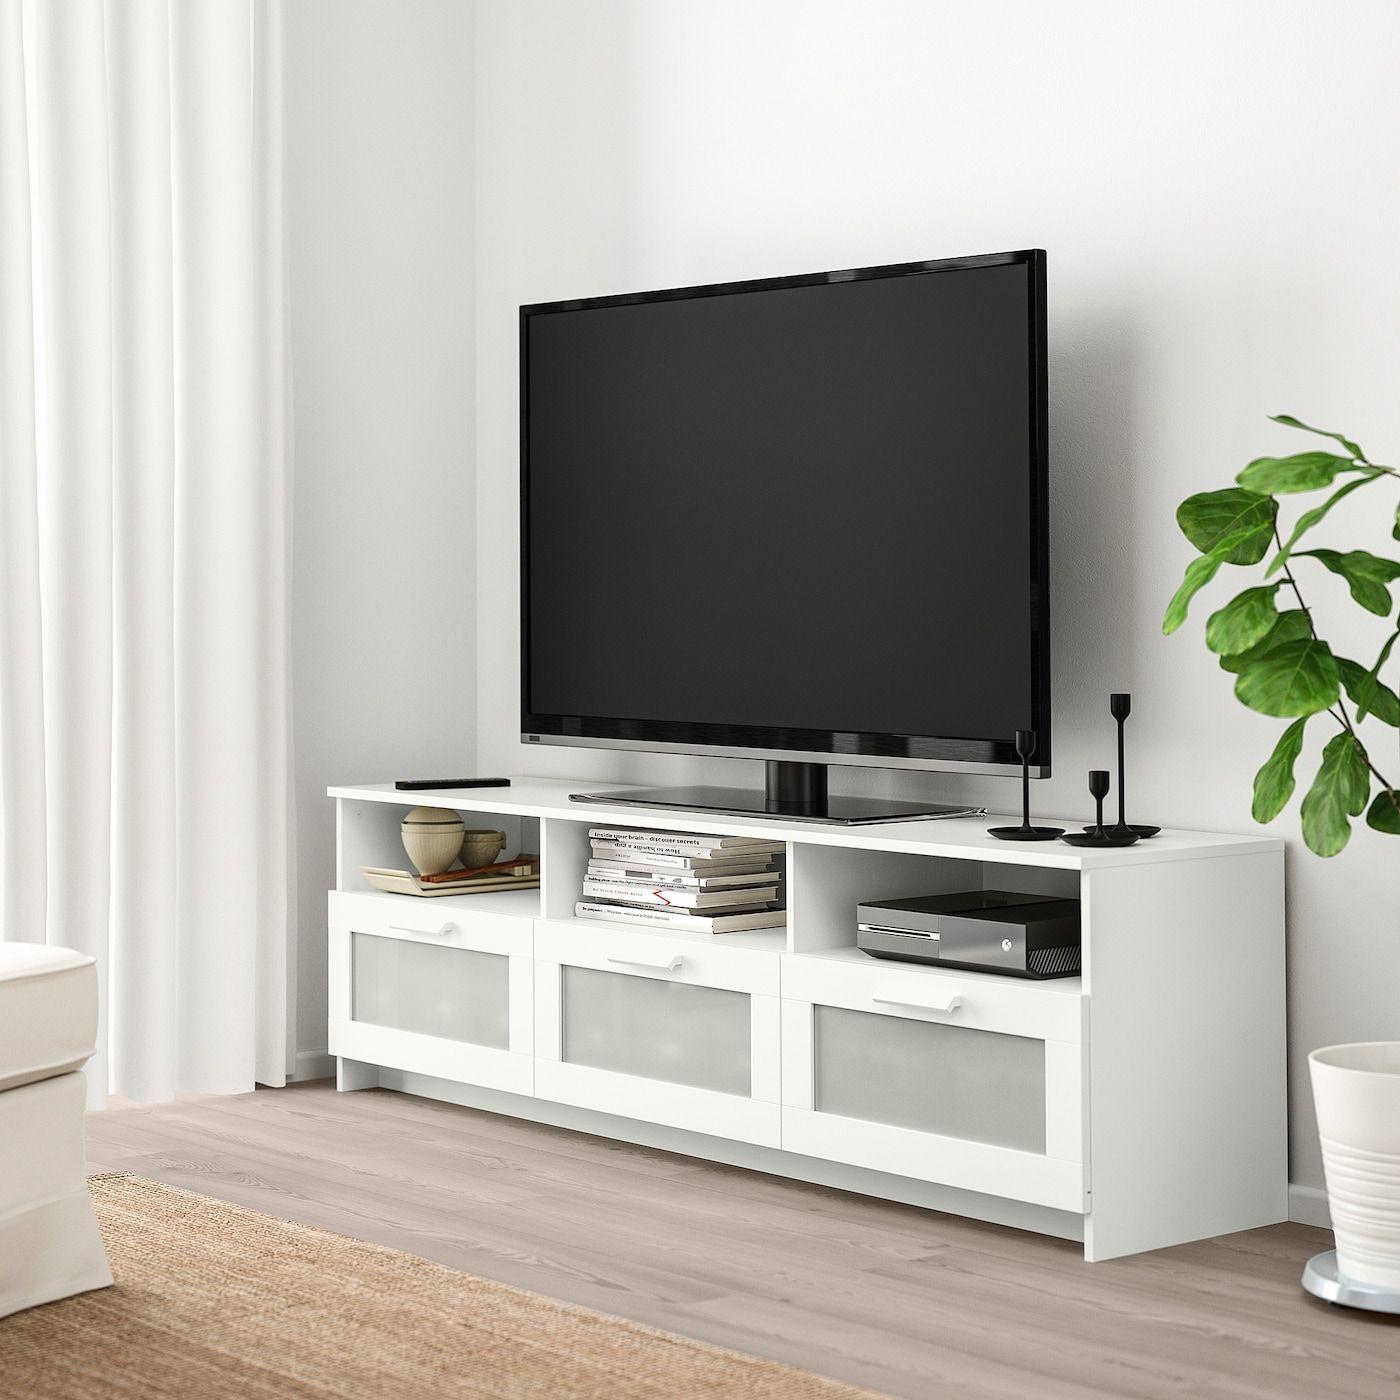 Brimnes Tv Unit White 70 7 8x16 1 8x20 7 8 Ikea Ikea Tv Stand Tv Bench Ikea Tv